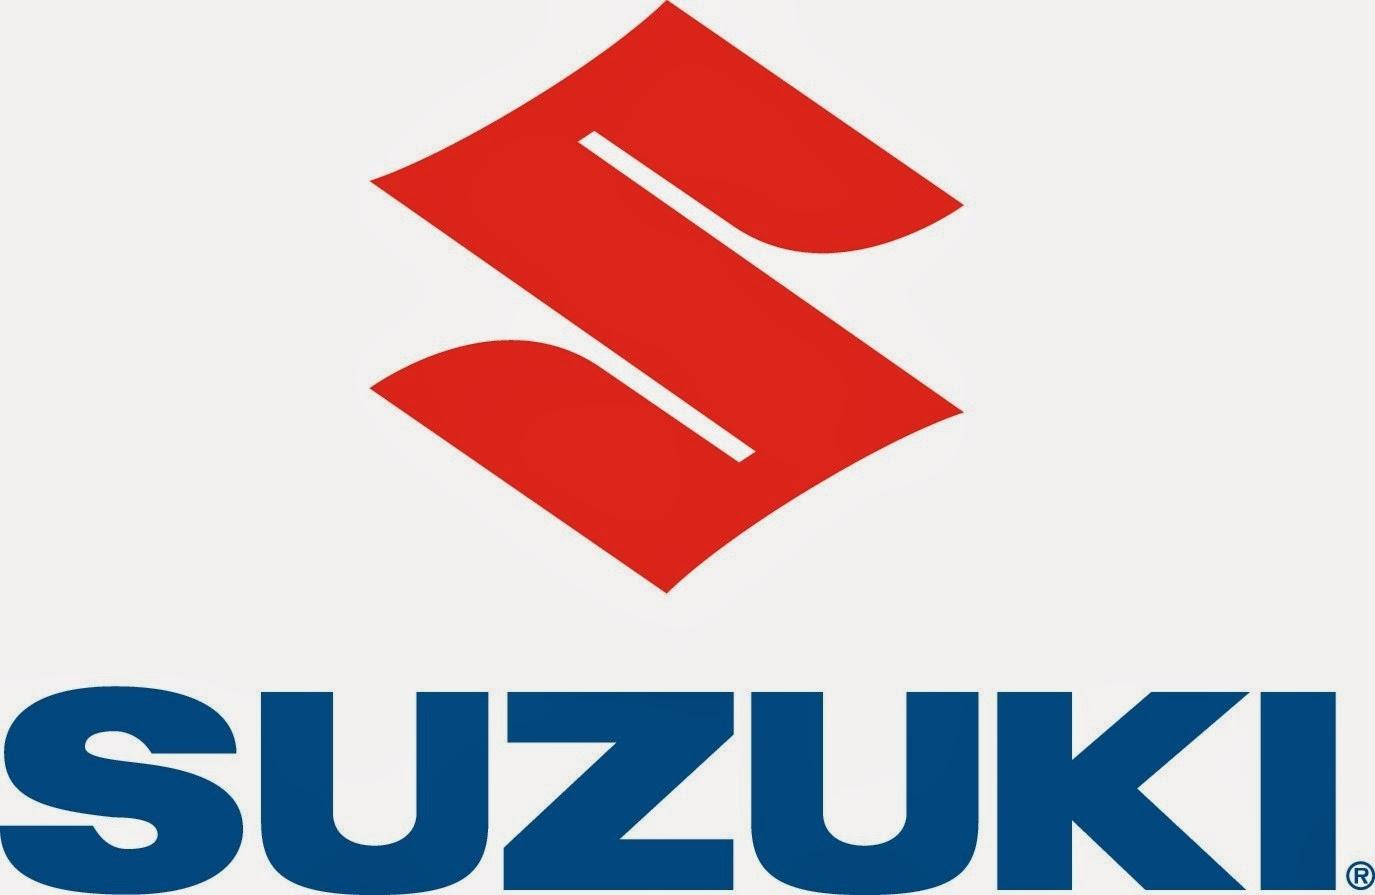 Description To Download And Set The Free HD Suzuki Logo Bilder Car Wallpaper As Desktop Background Computer Laptops Etc Device